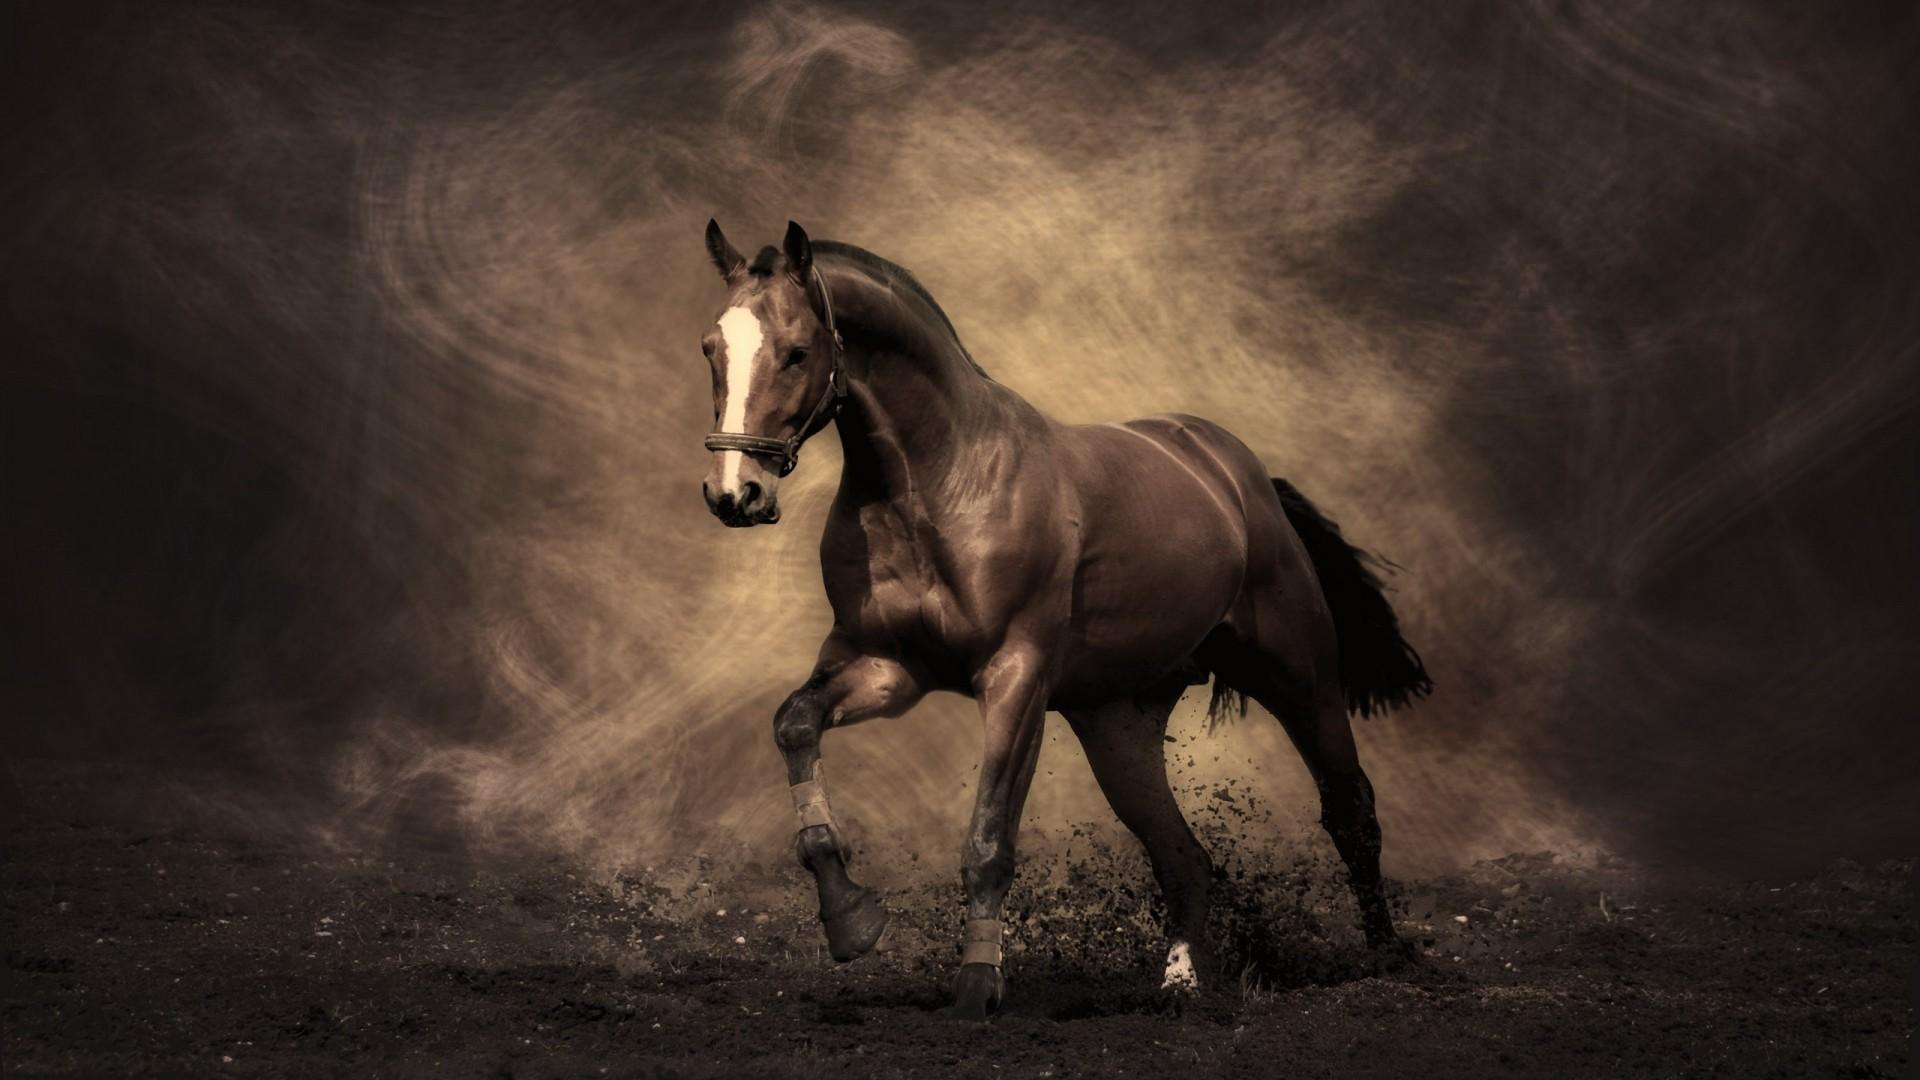 Arabian Racing Horse Desktop High Quality Wallpapers 1920x1080